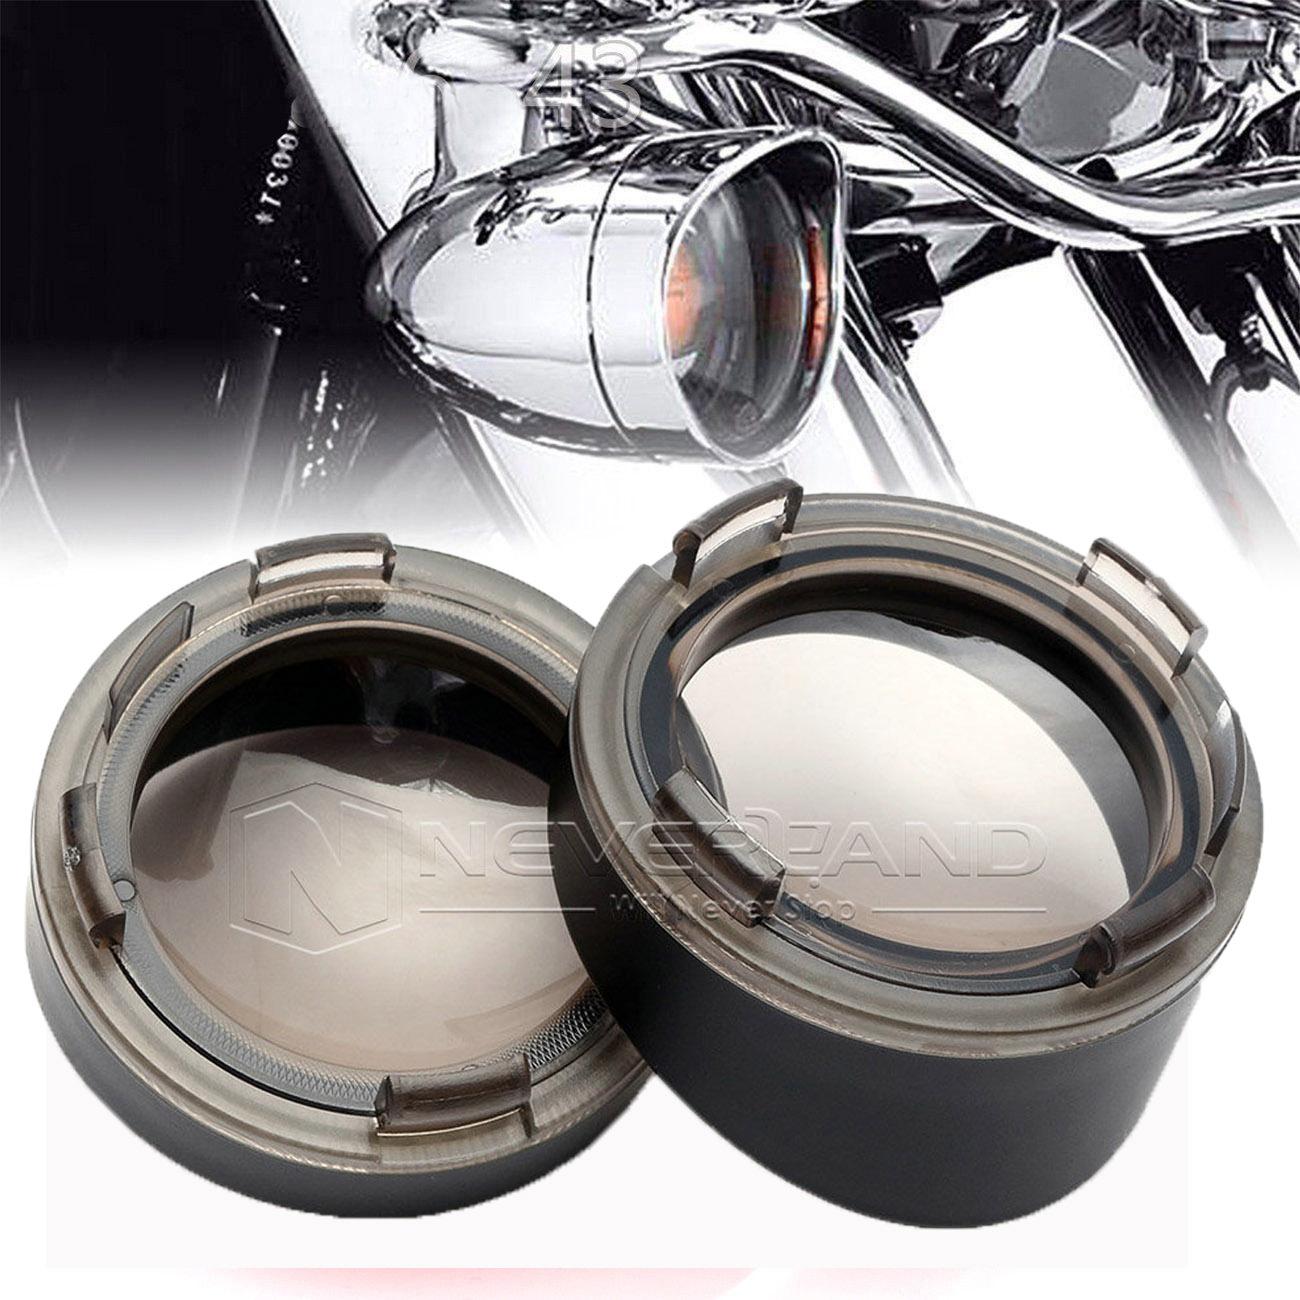 Turn Signal Bezels Visor-Style For Harley Softail Springer Heritage Classic